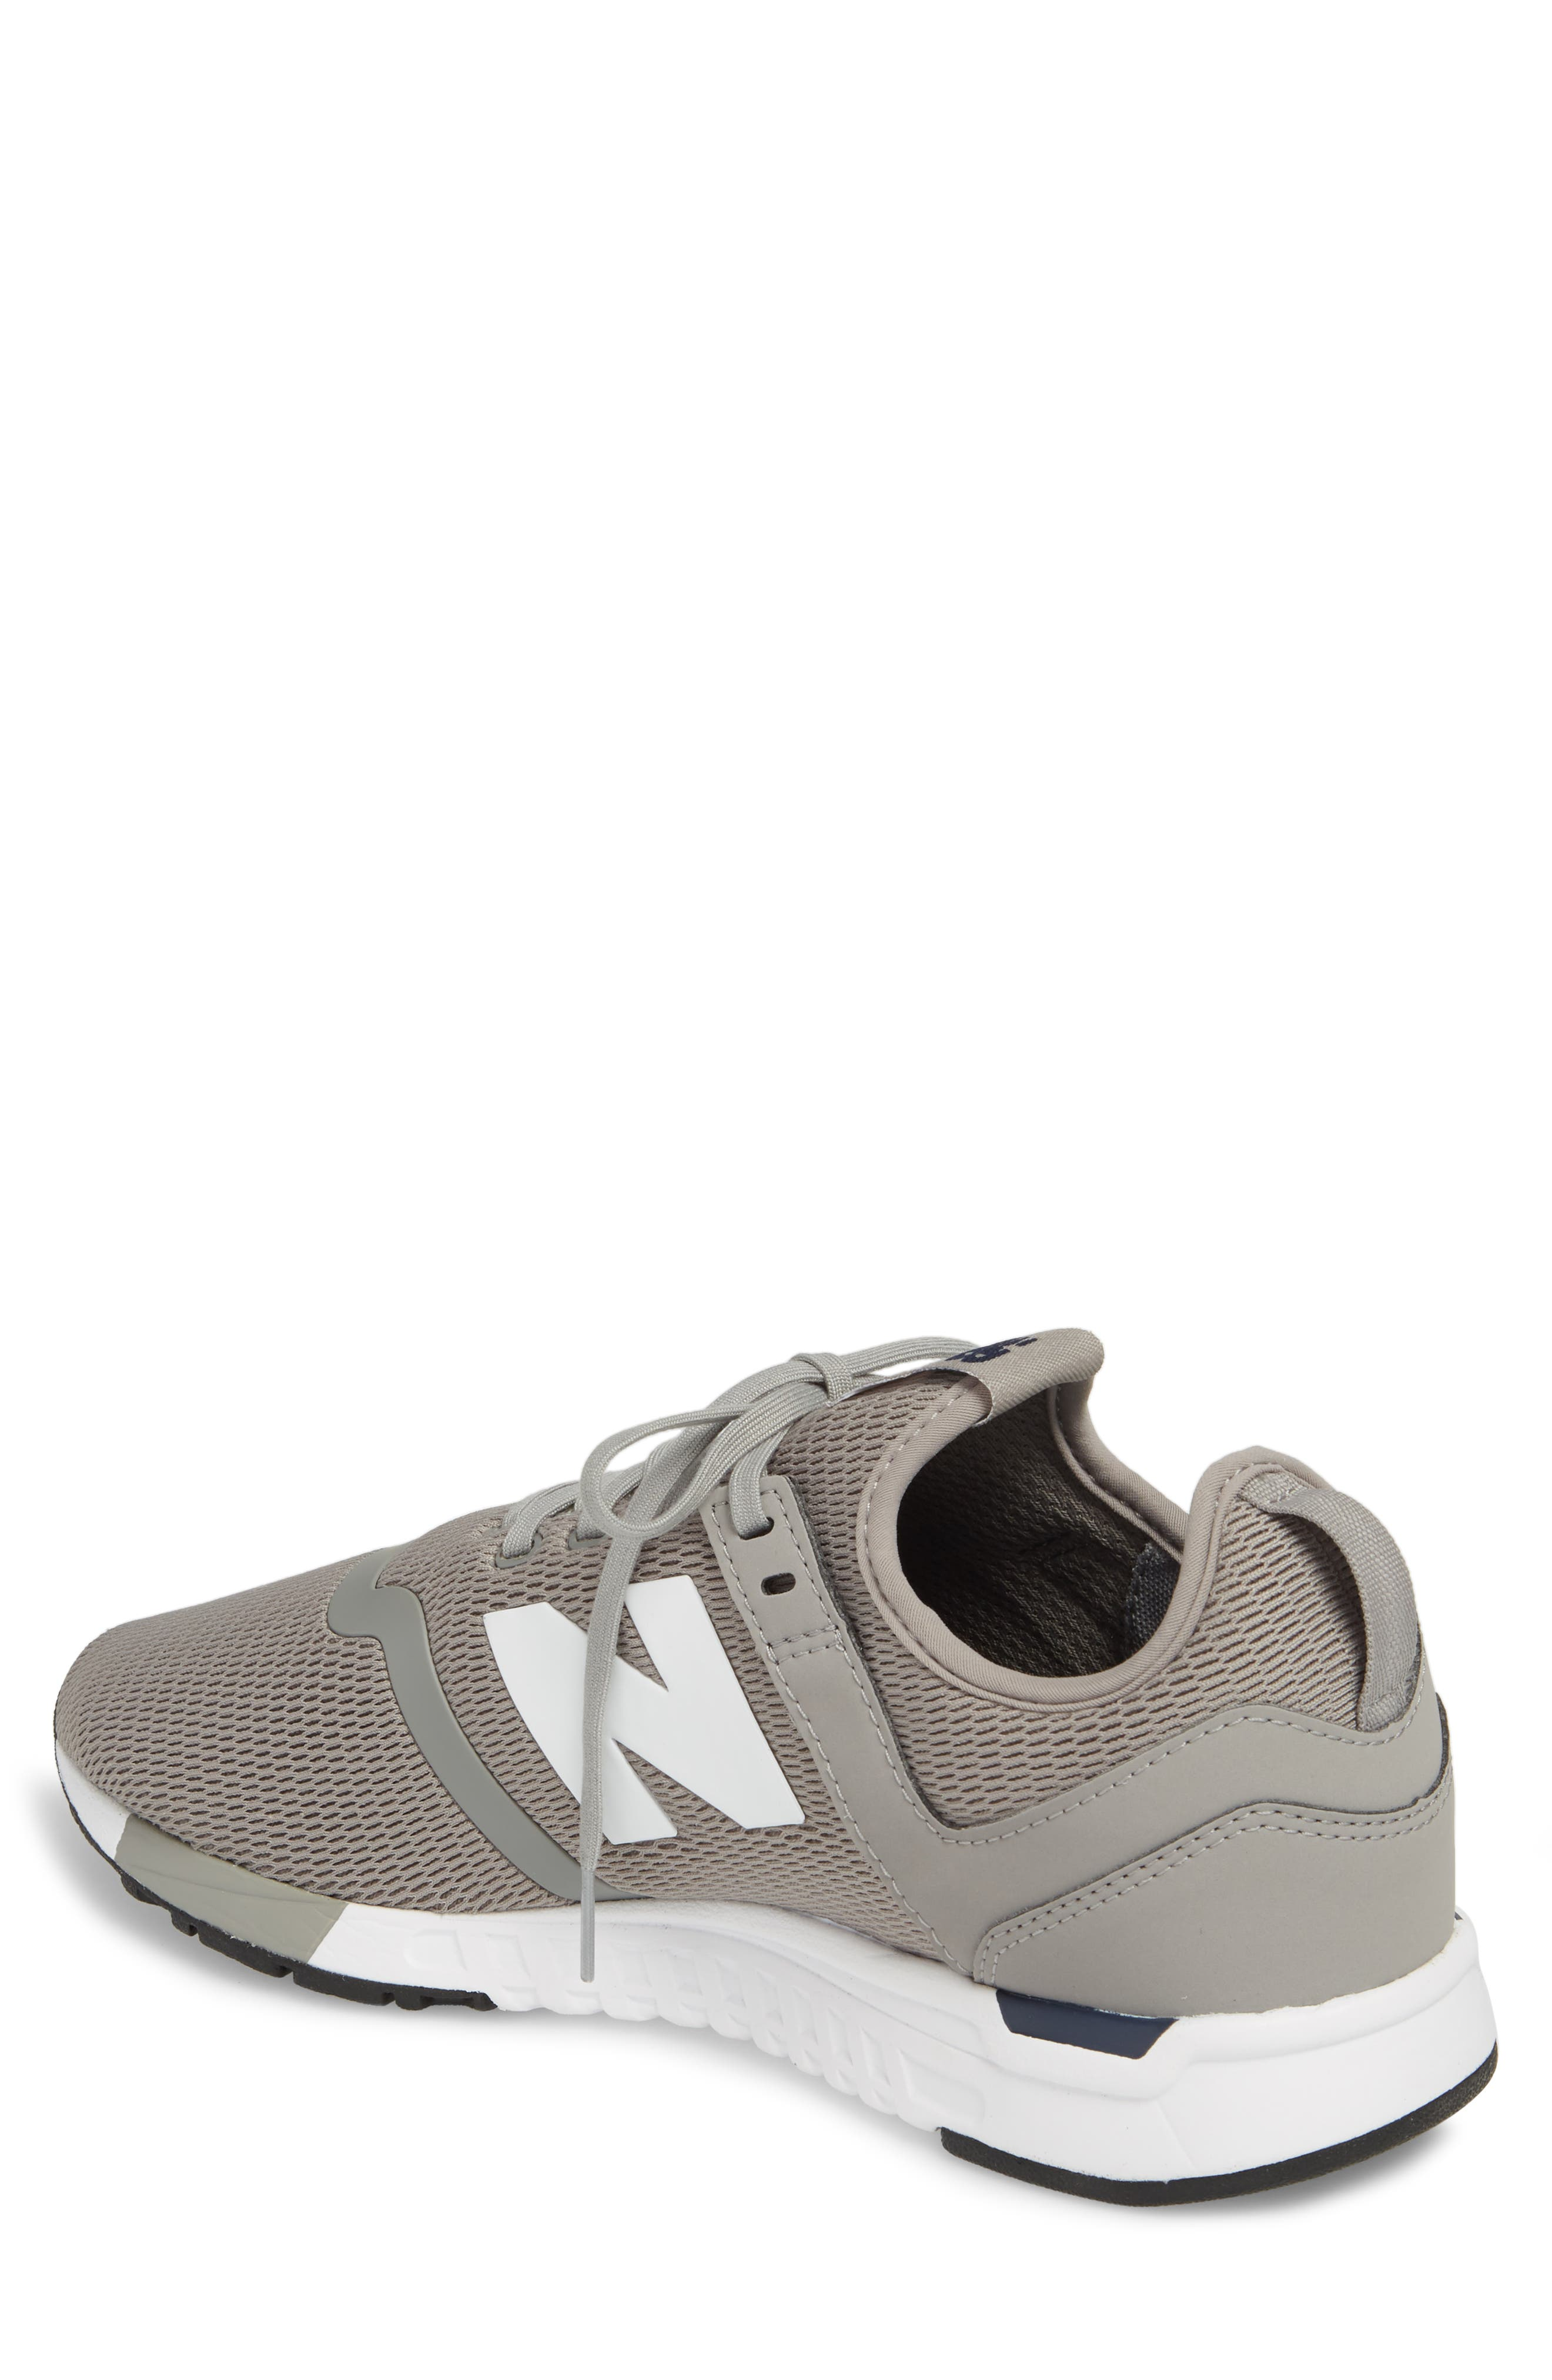 247 Sneaker,                             Alternate thumbnail 2, color,                             Steel